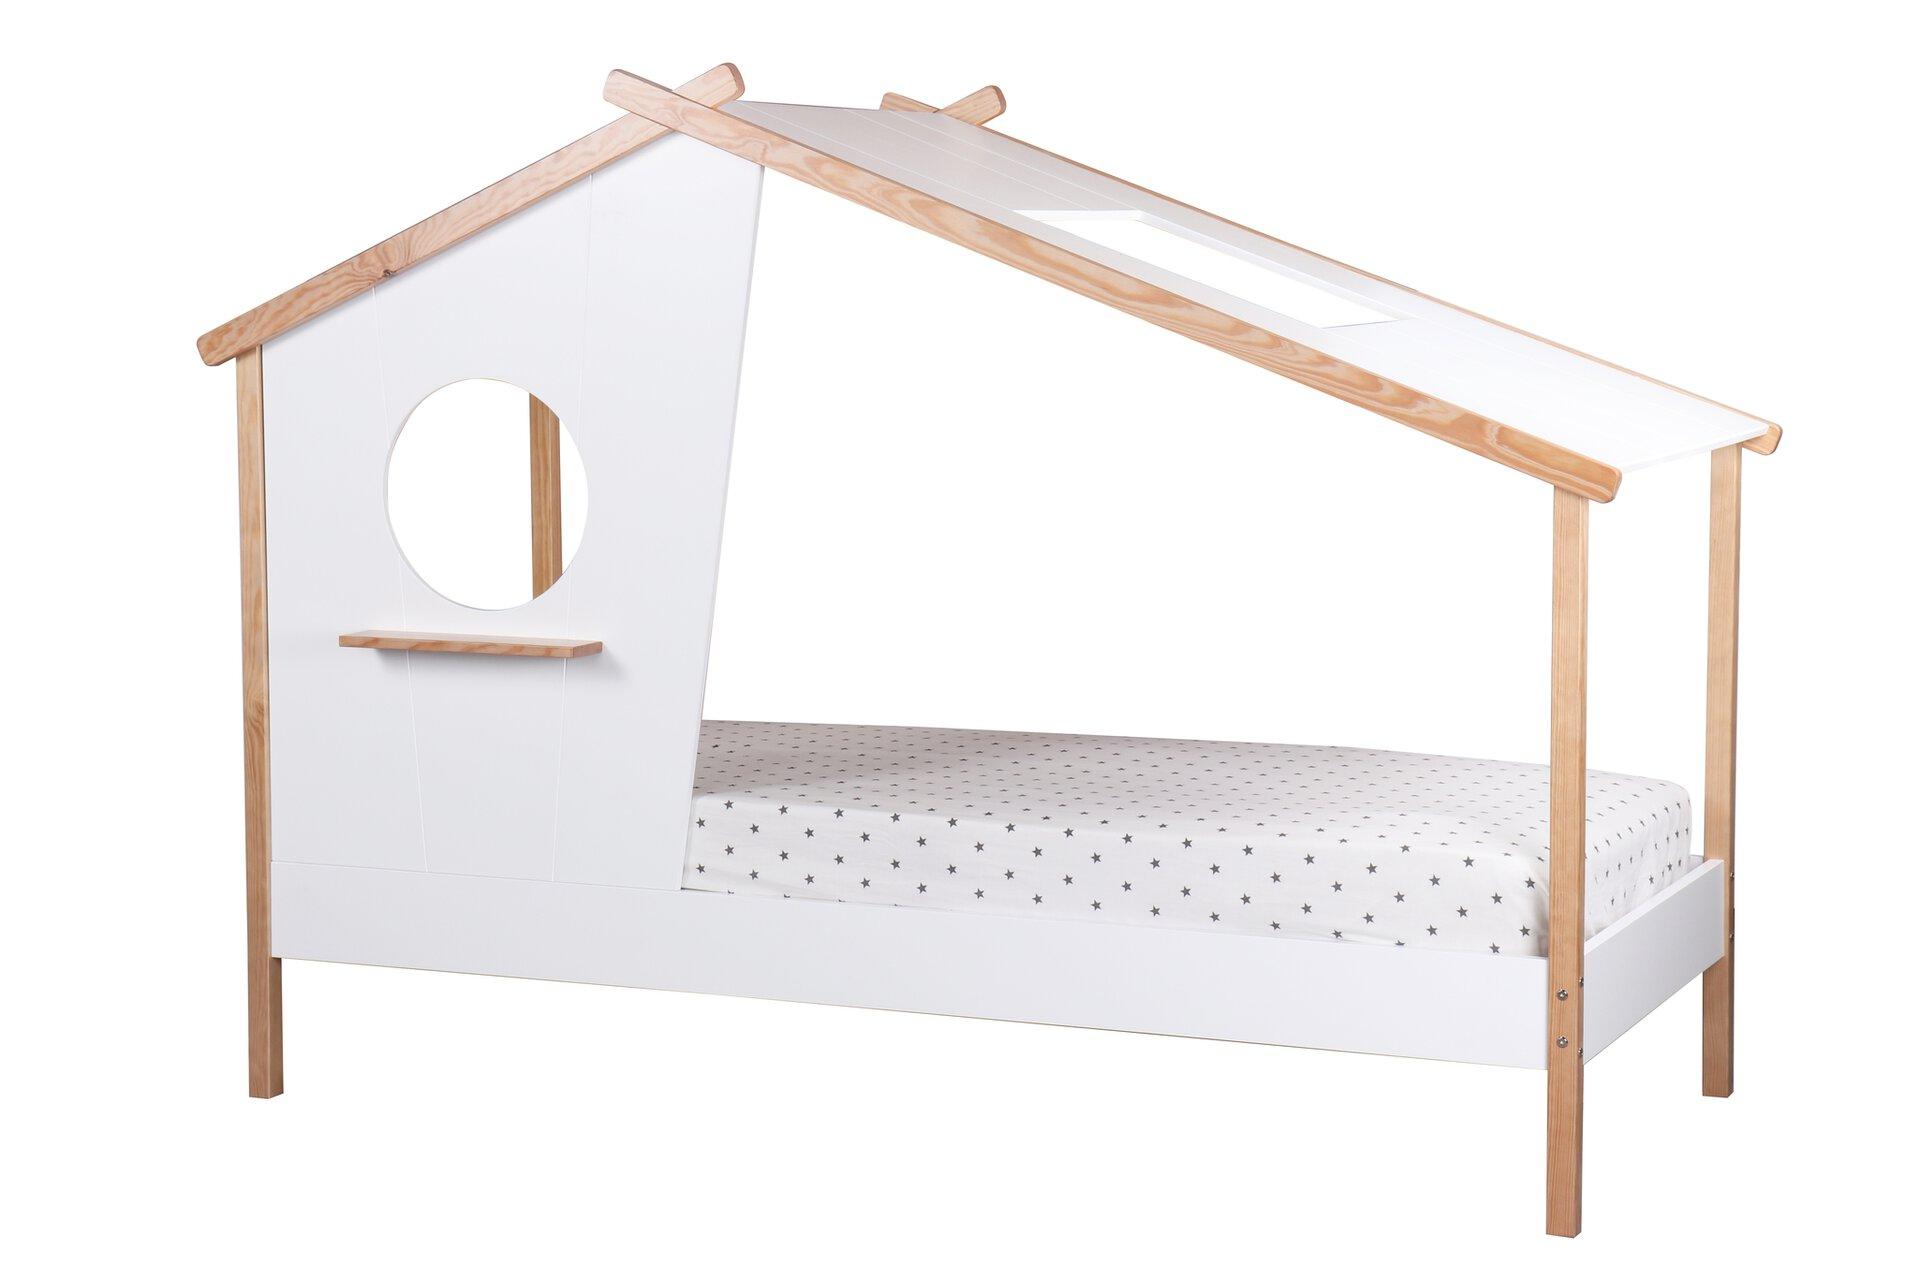 Kinderbett AMELIE inbuy Holzwerkstoff weiß 105 x 159 x 210 cm